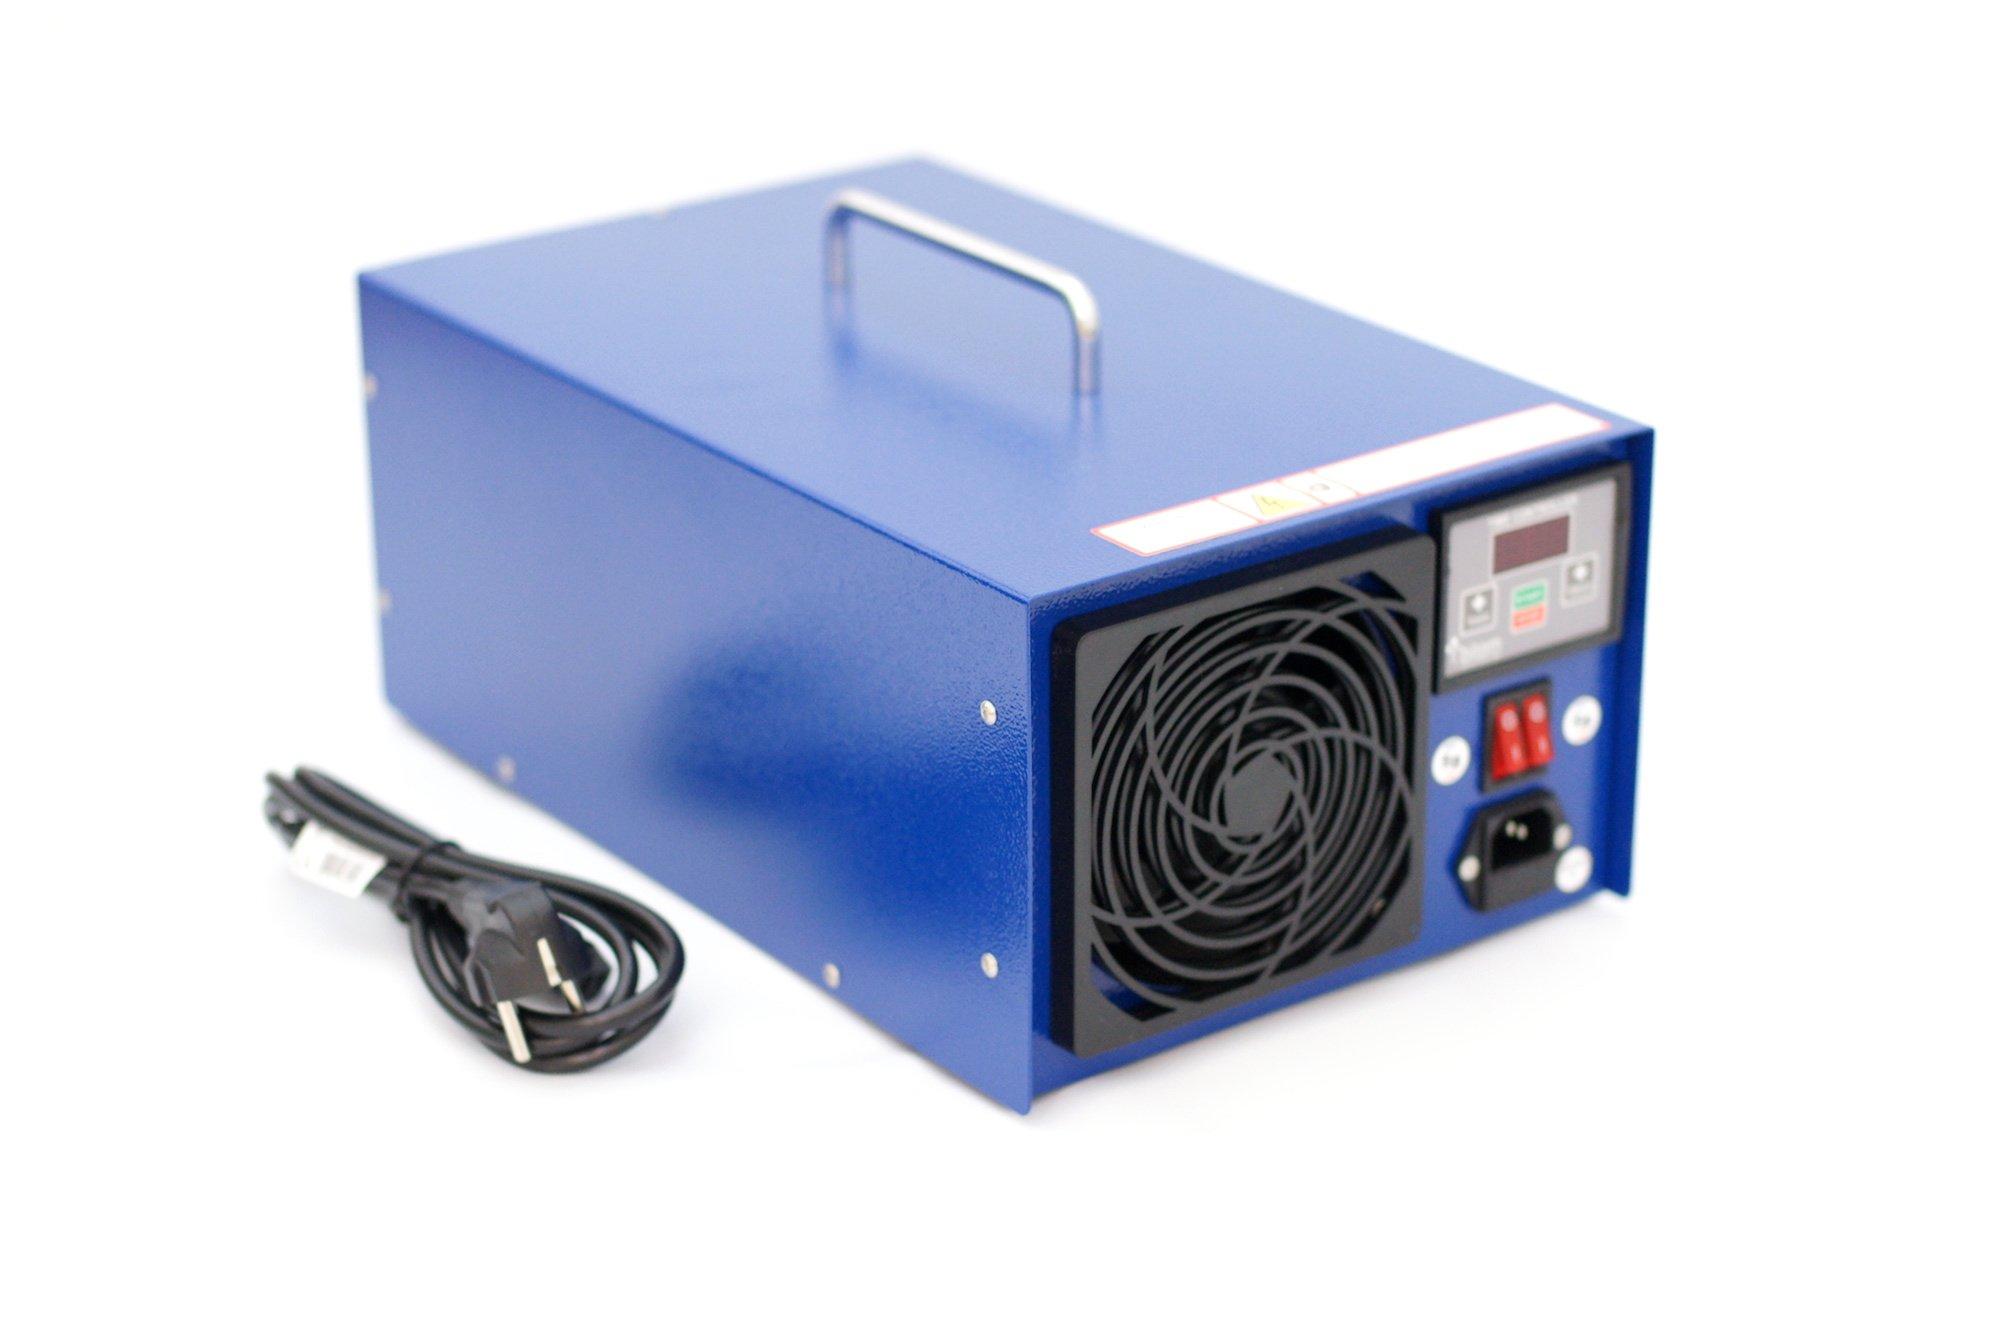 Profesional Ozono generador Ozono dispositivo 10000 MG/H 10 g/h ...